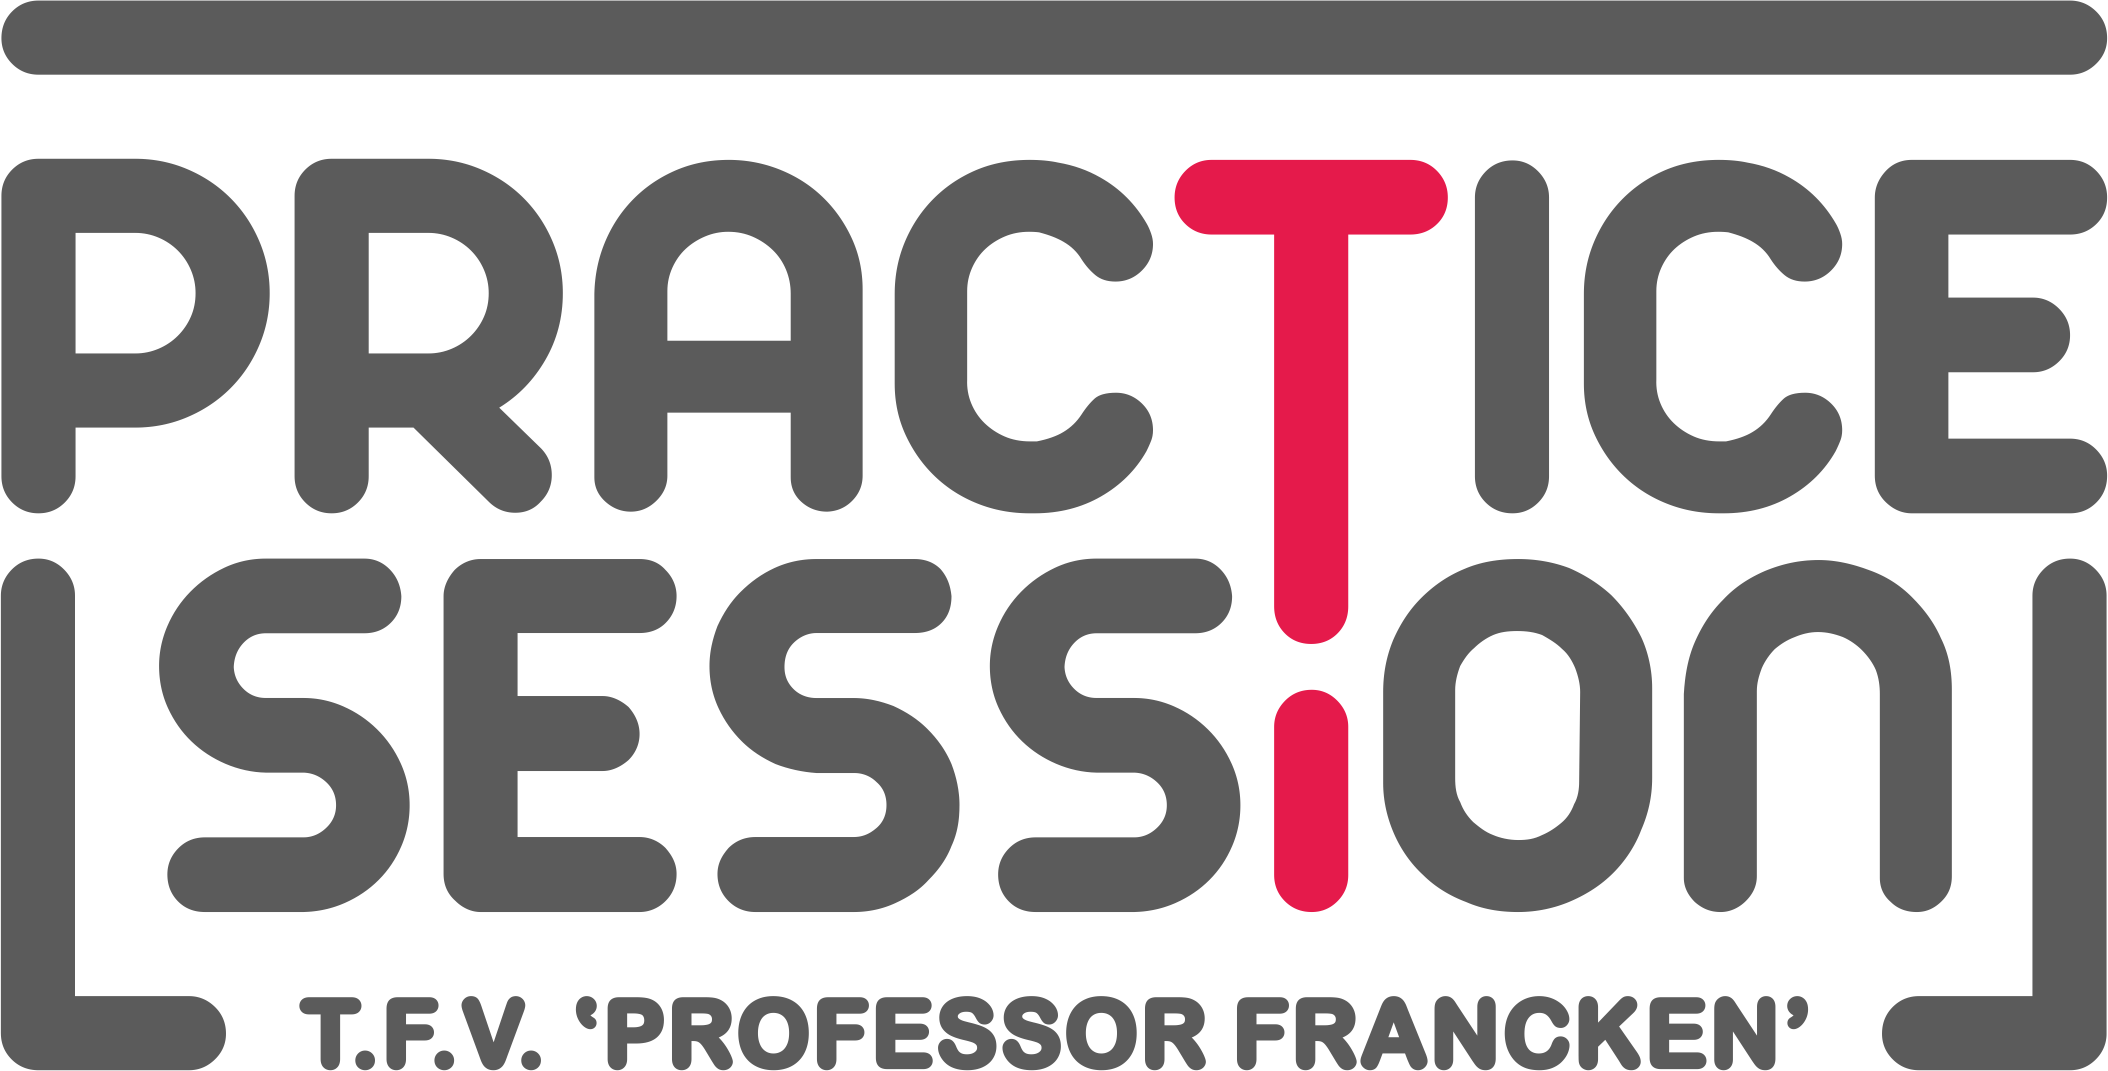 Oefensescie's logo